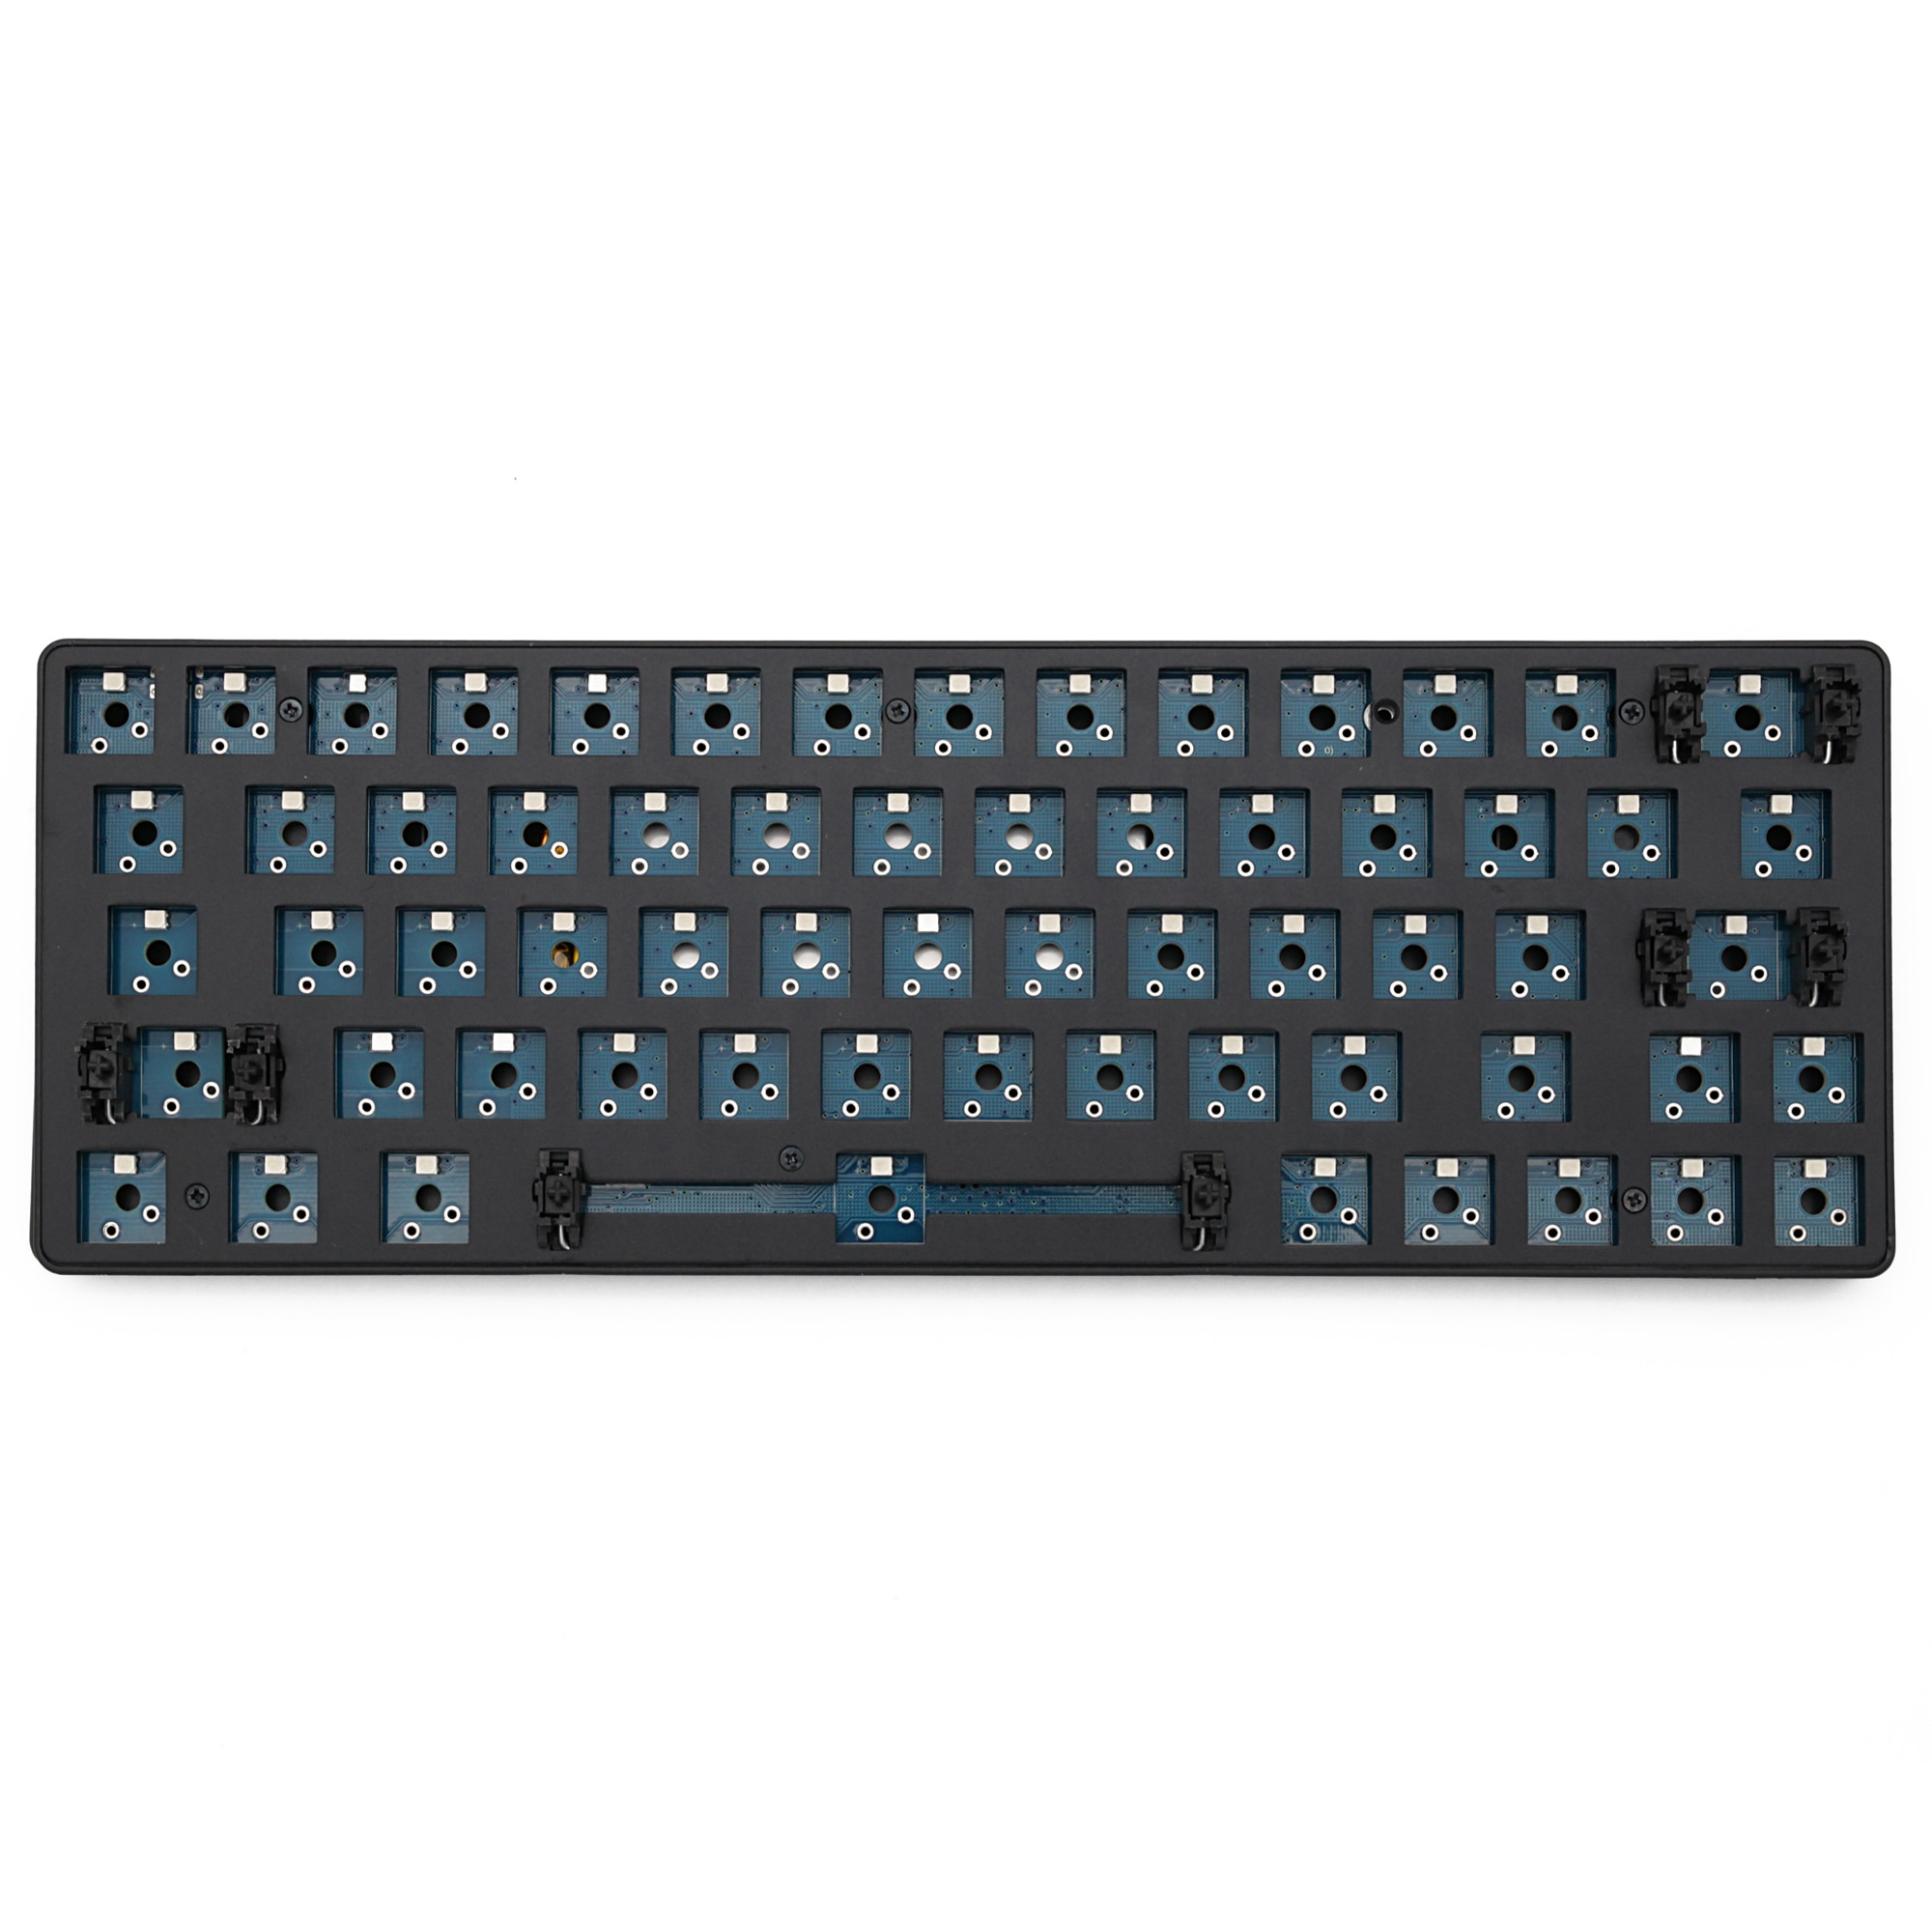 Dierya 63 60% bluetooth 63 kit dual mode wireless pcb Custom Mechanical Keyboard rgb smd switch leds type c and mini cable